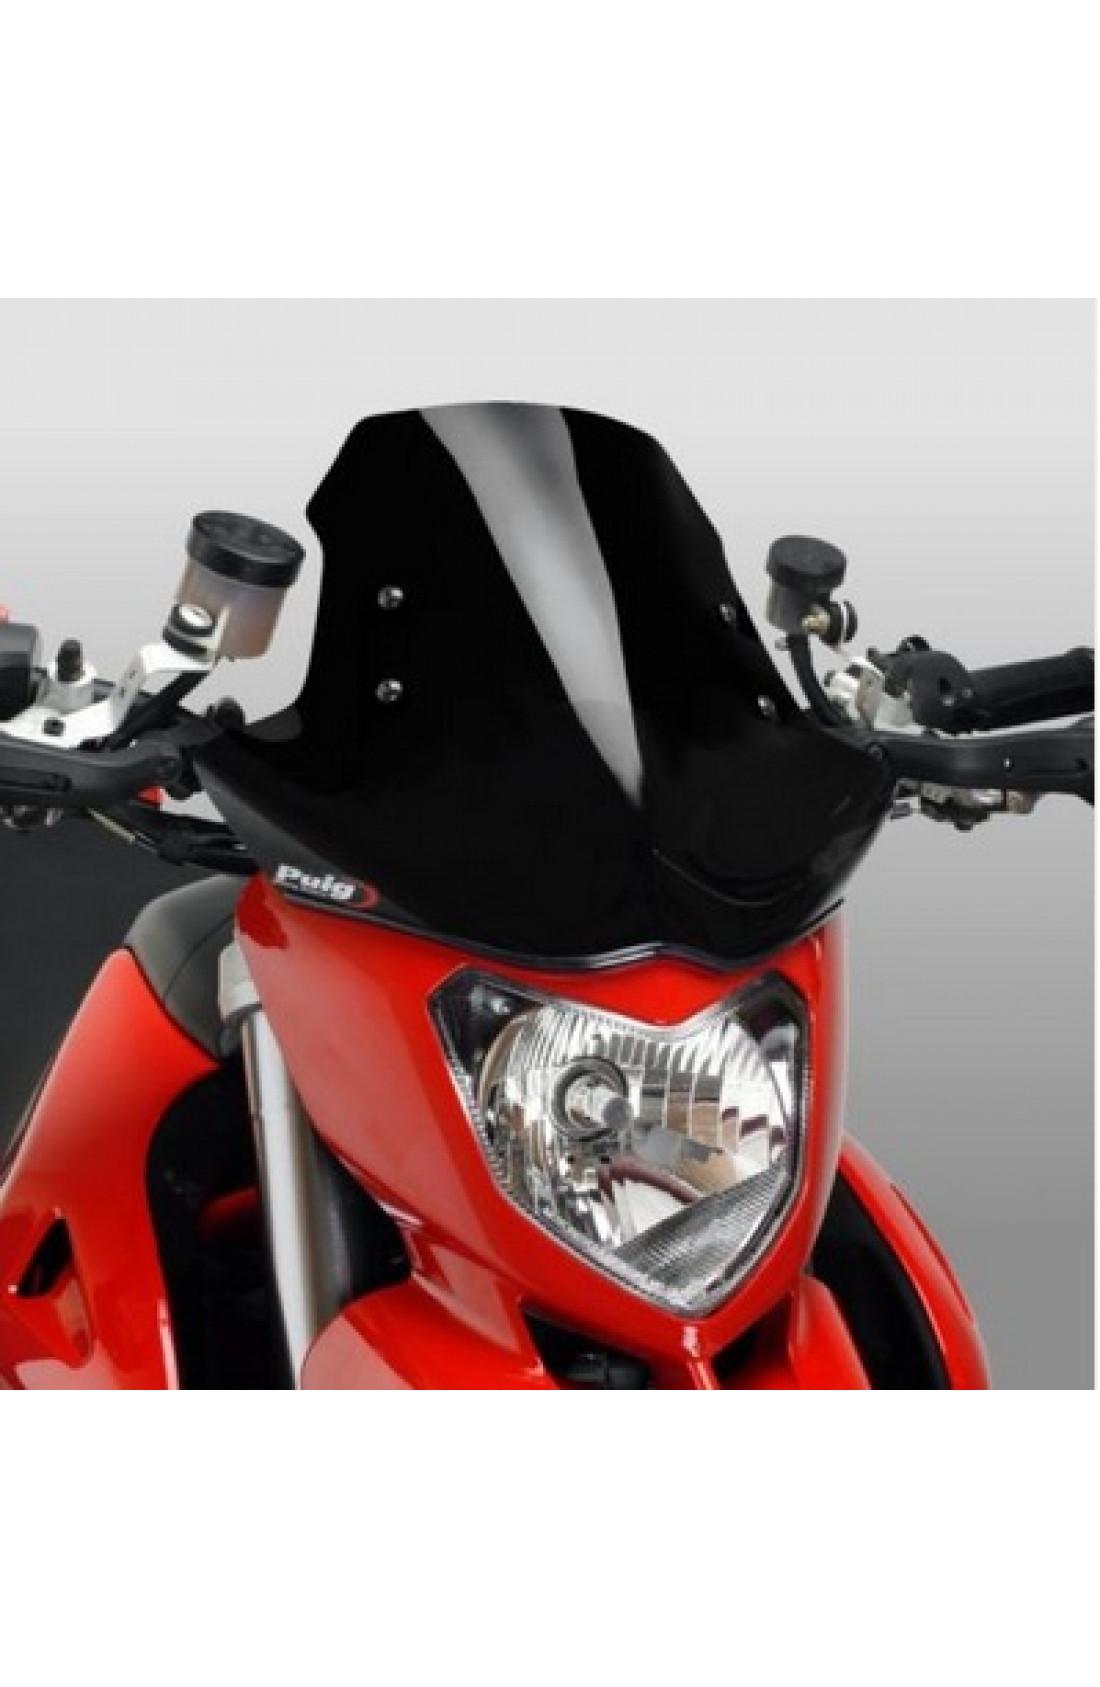 Ducati Hypermotard 796/1100/S Puig Naked New Generation